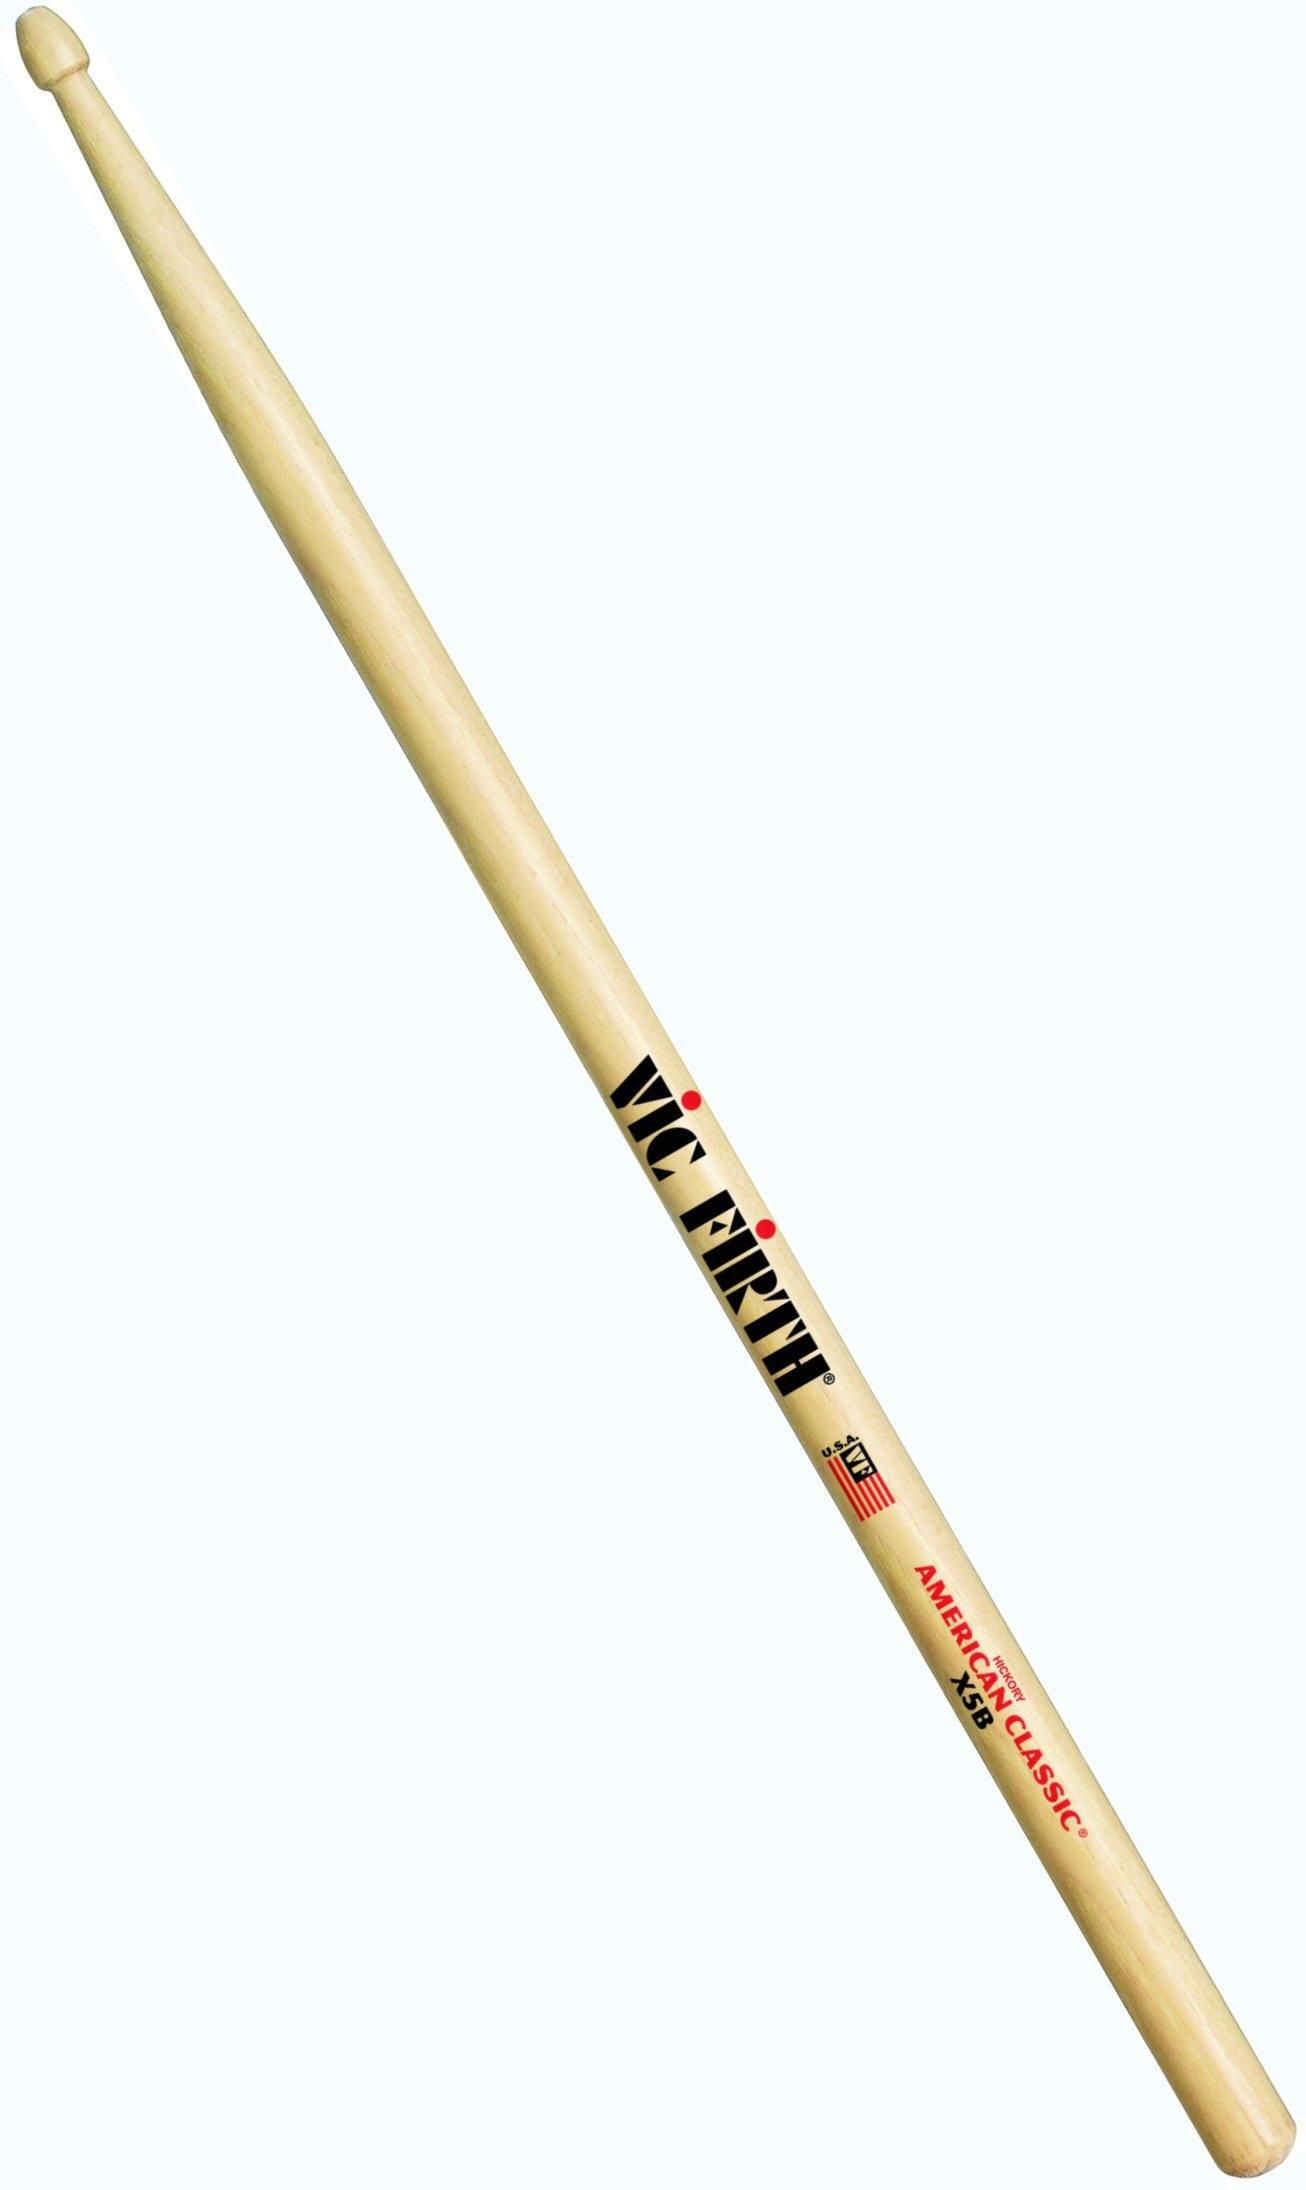 Extreme 5B Wood Tip Drum Sticks: Drumsticks